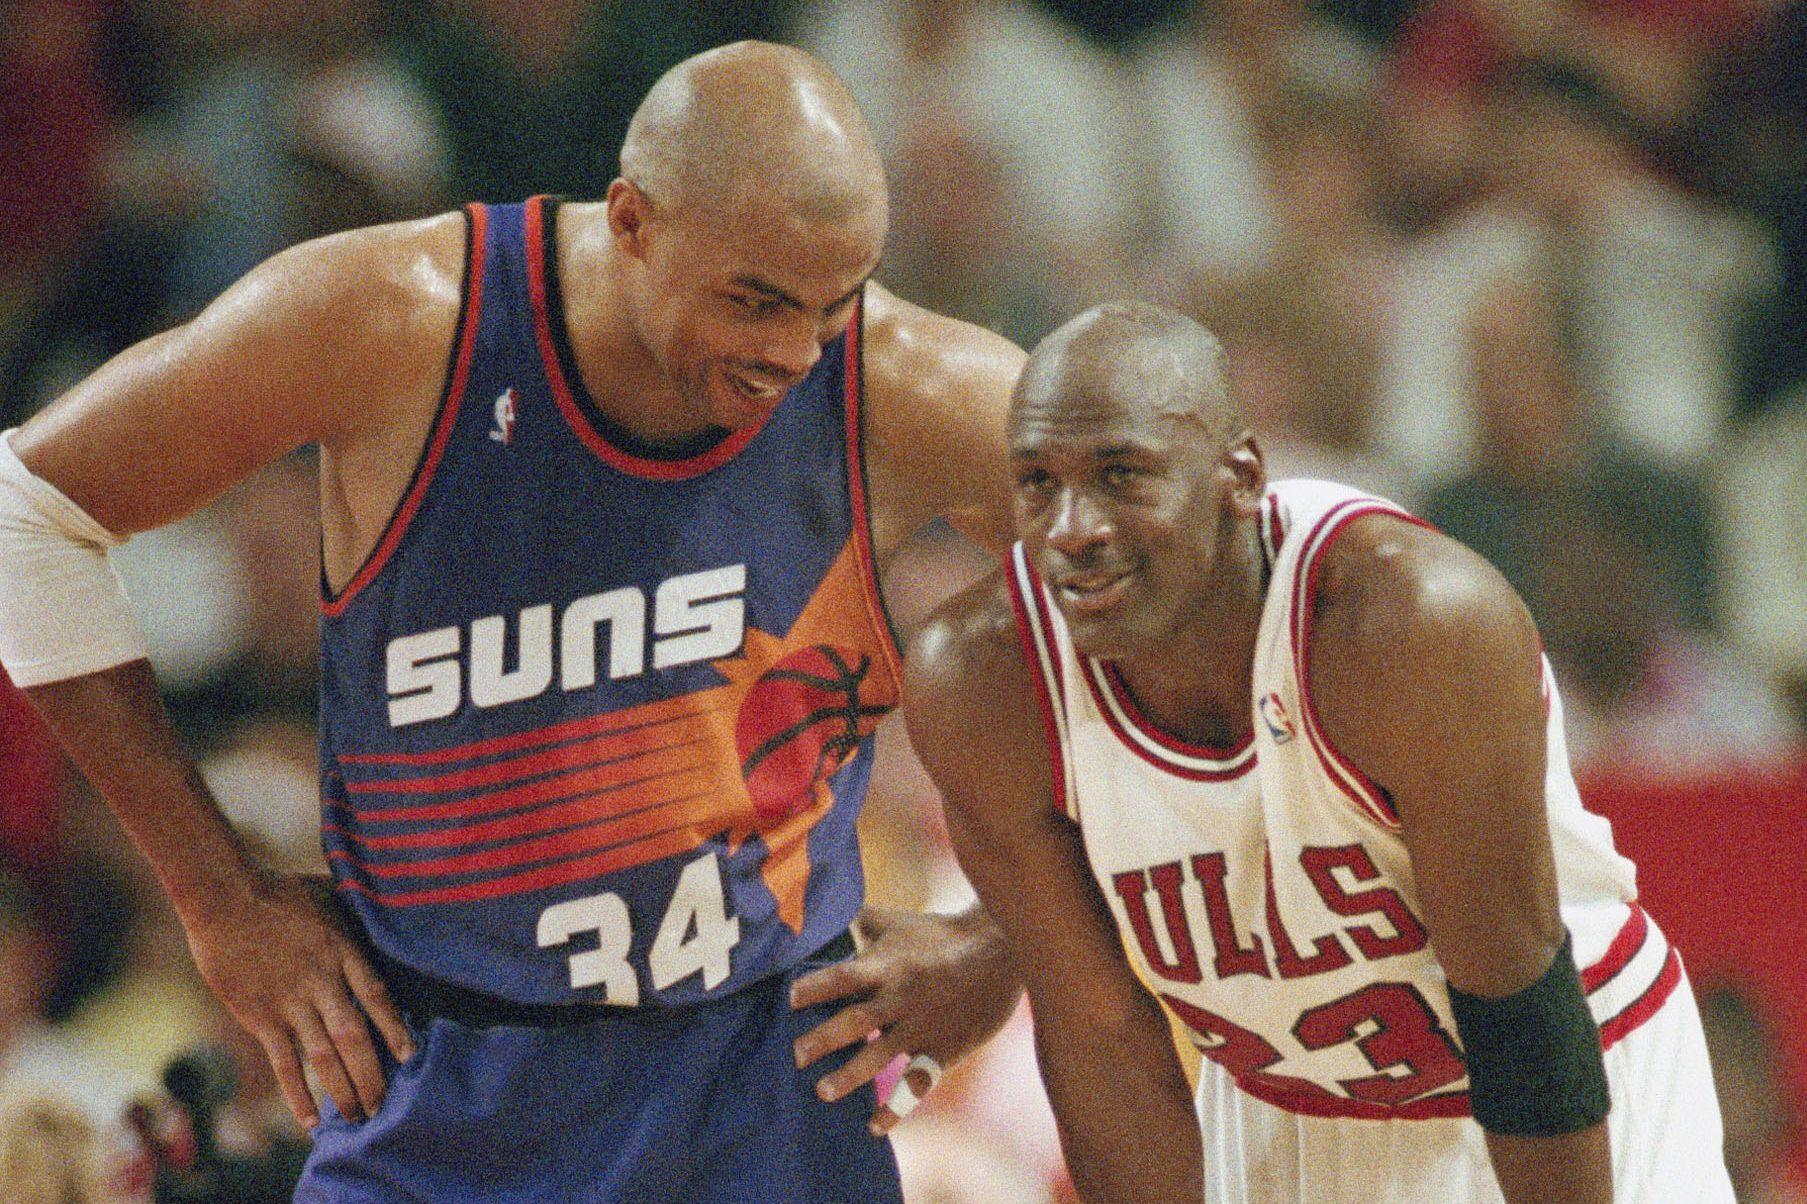 Charles Barkley and Michael Jordan 1993